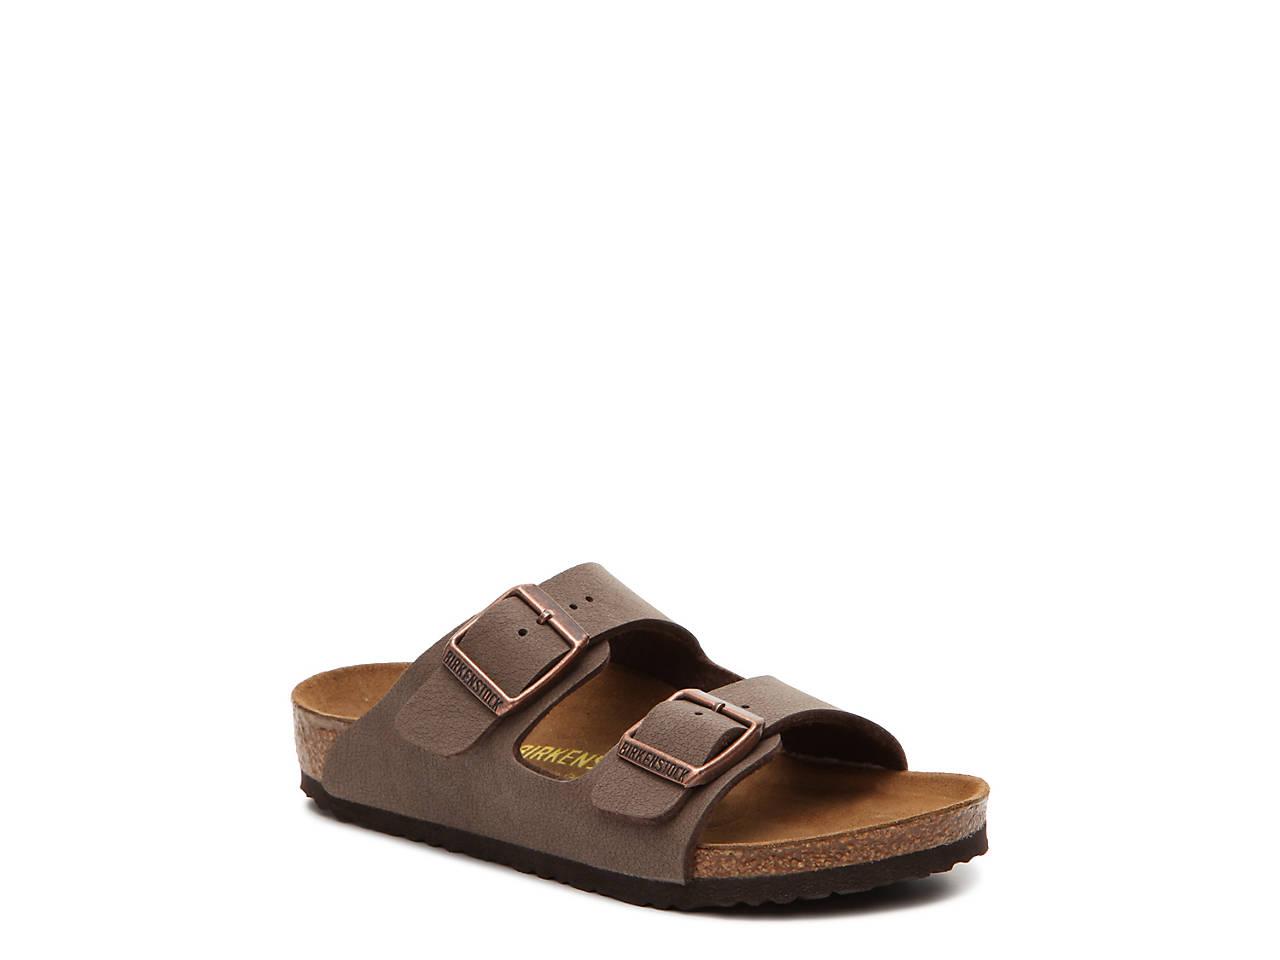 22a9b4ed5fb1 Birkenstock Arizona Toddler   Youth Flat Sandal - Girls Kids Shoes